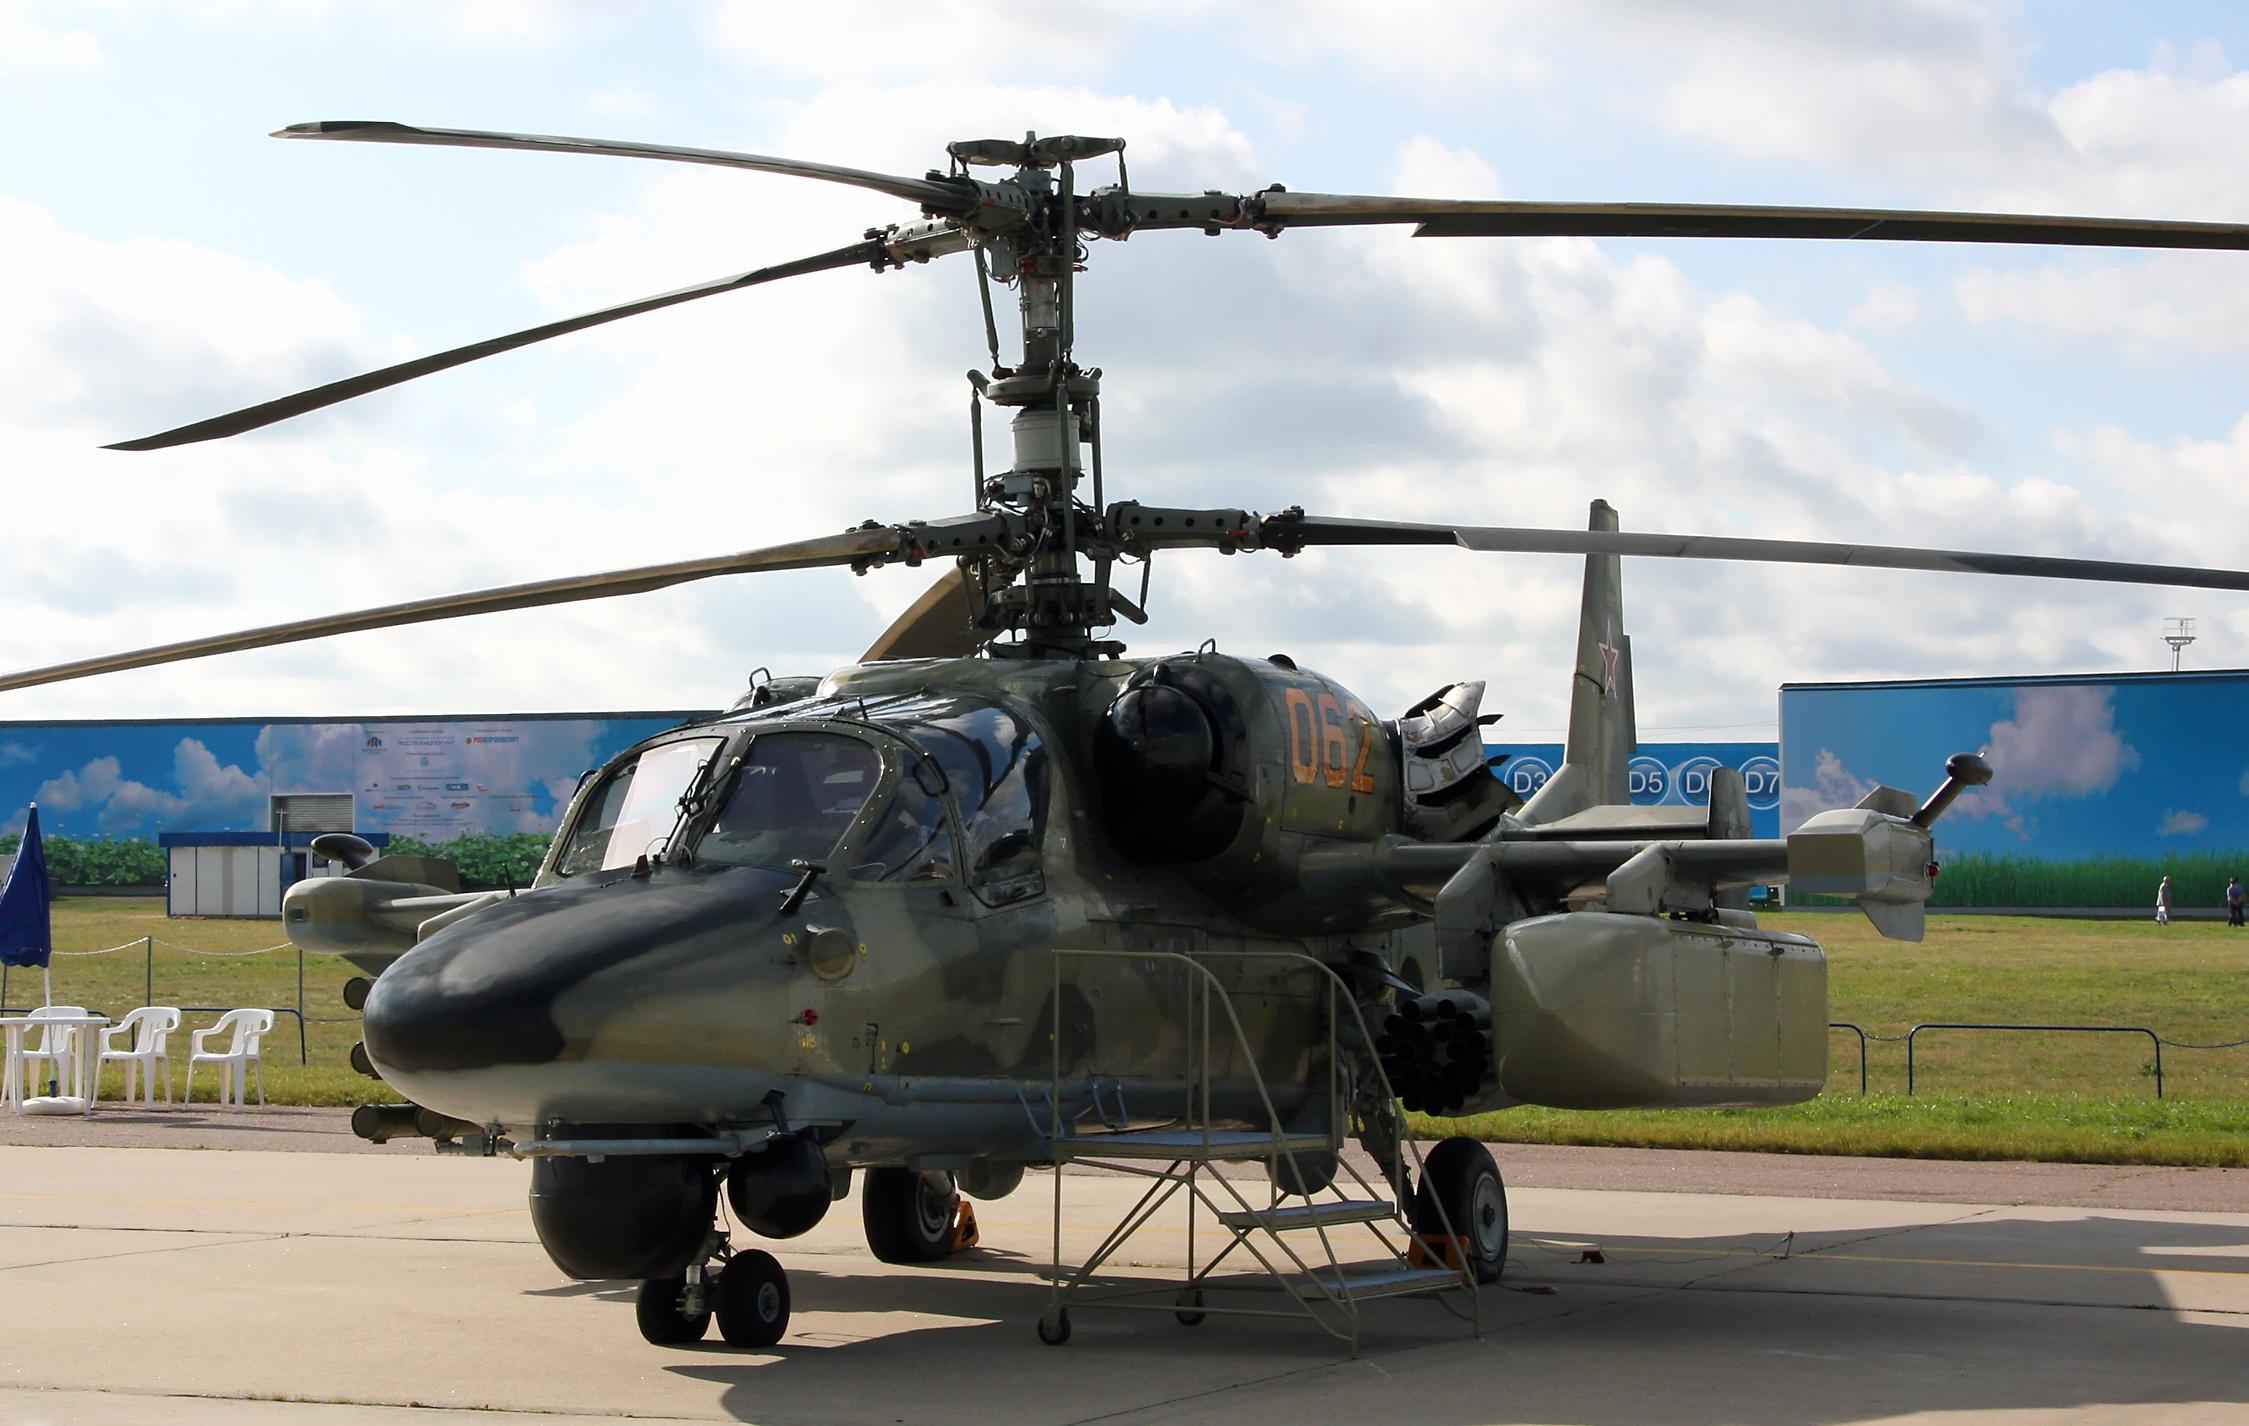 Elicottero Ka 52 : File ka attack helicopter g wikimedia commons